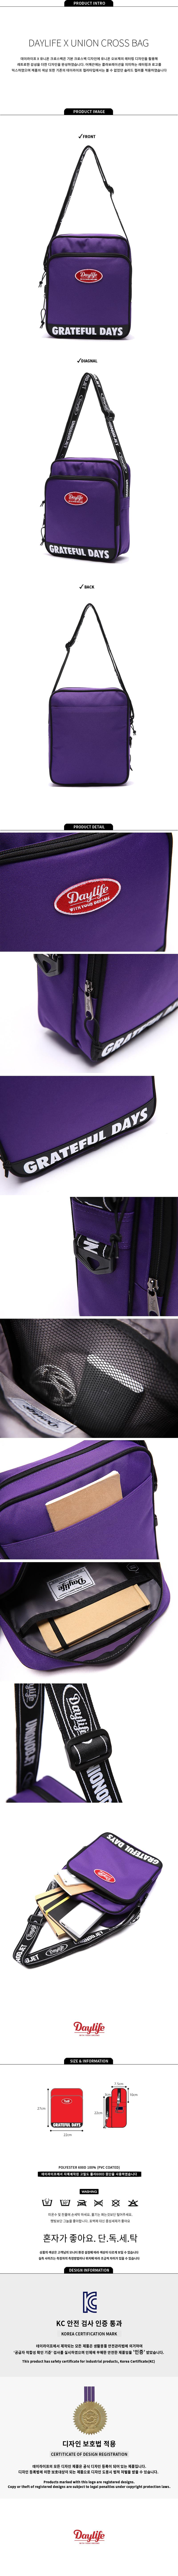 f_product_dayuni_cross_violet.jpg